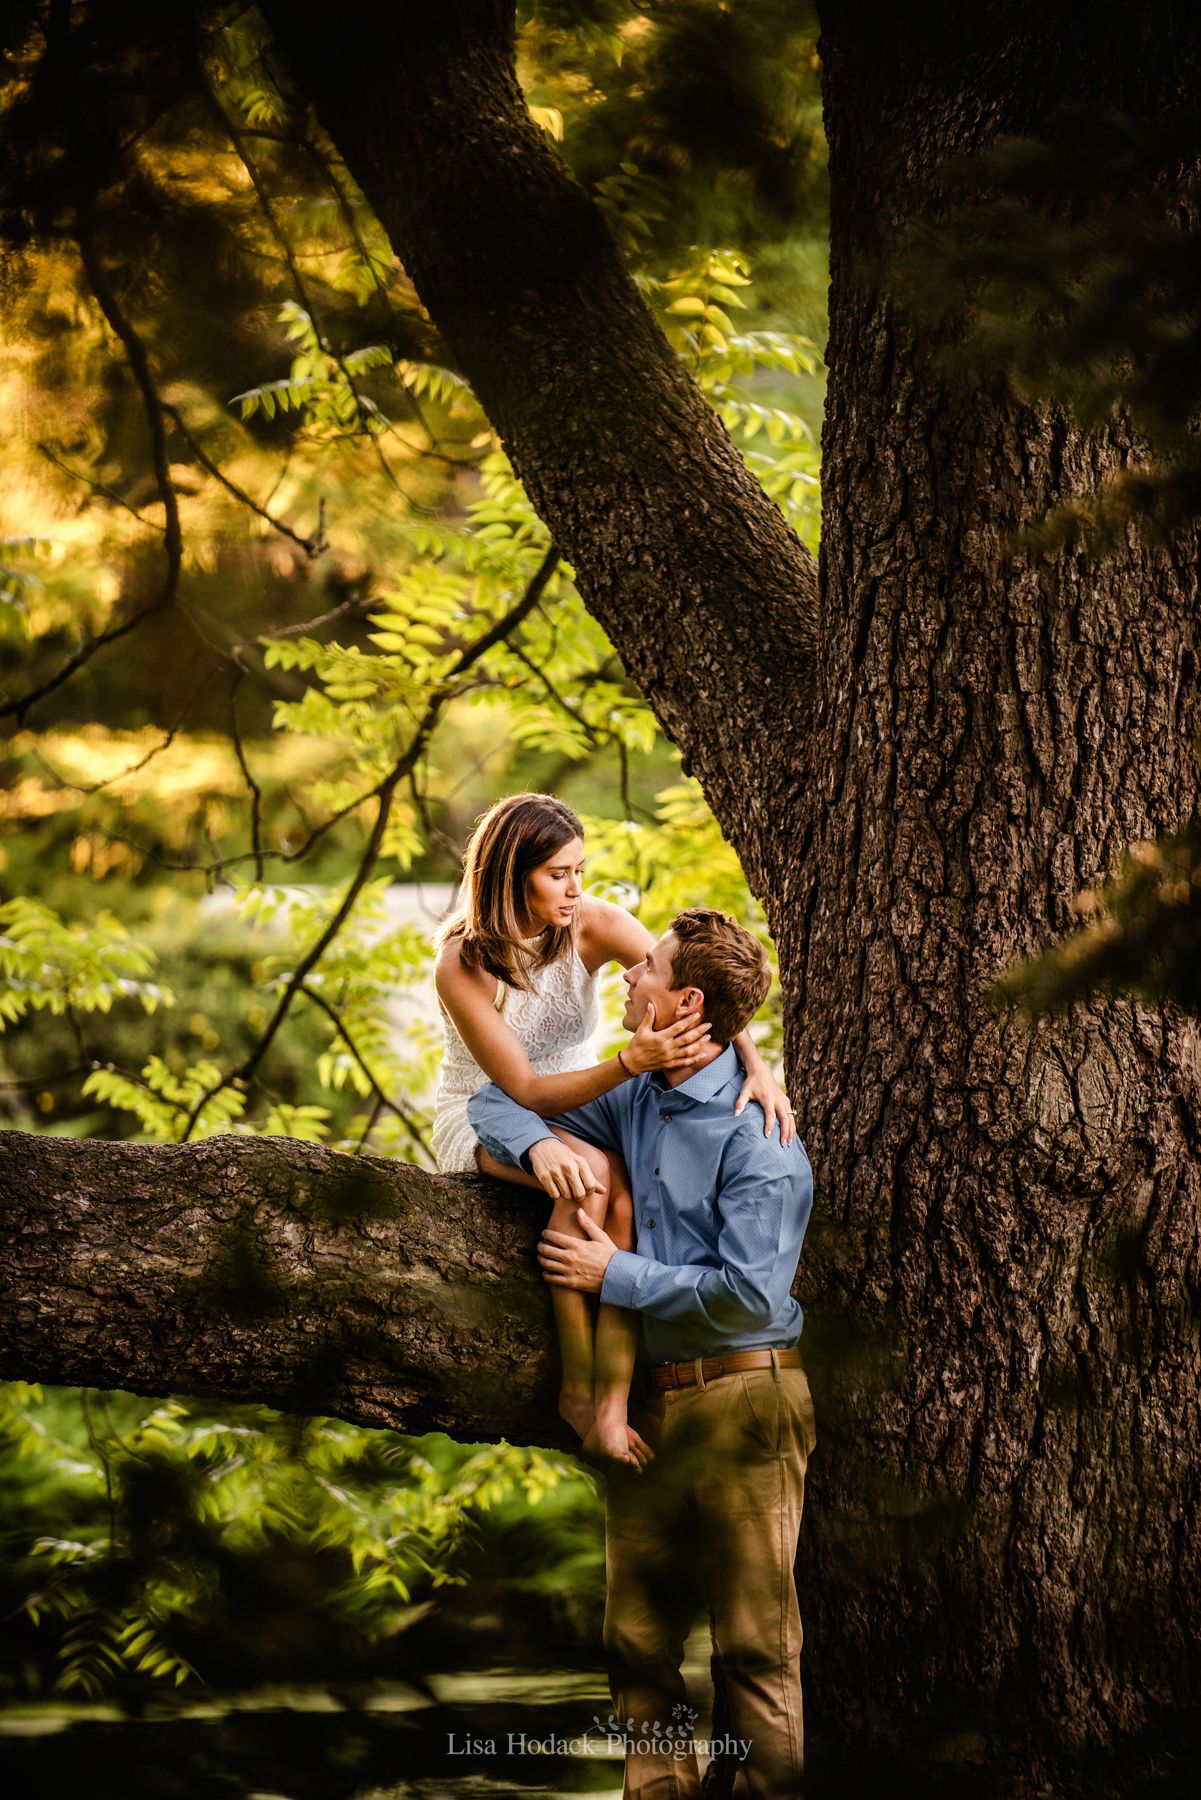 Dow Gardens, Midland, Michigan, Engagement Session | Lisa Hodack ...